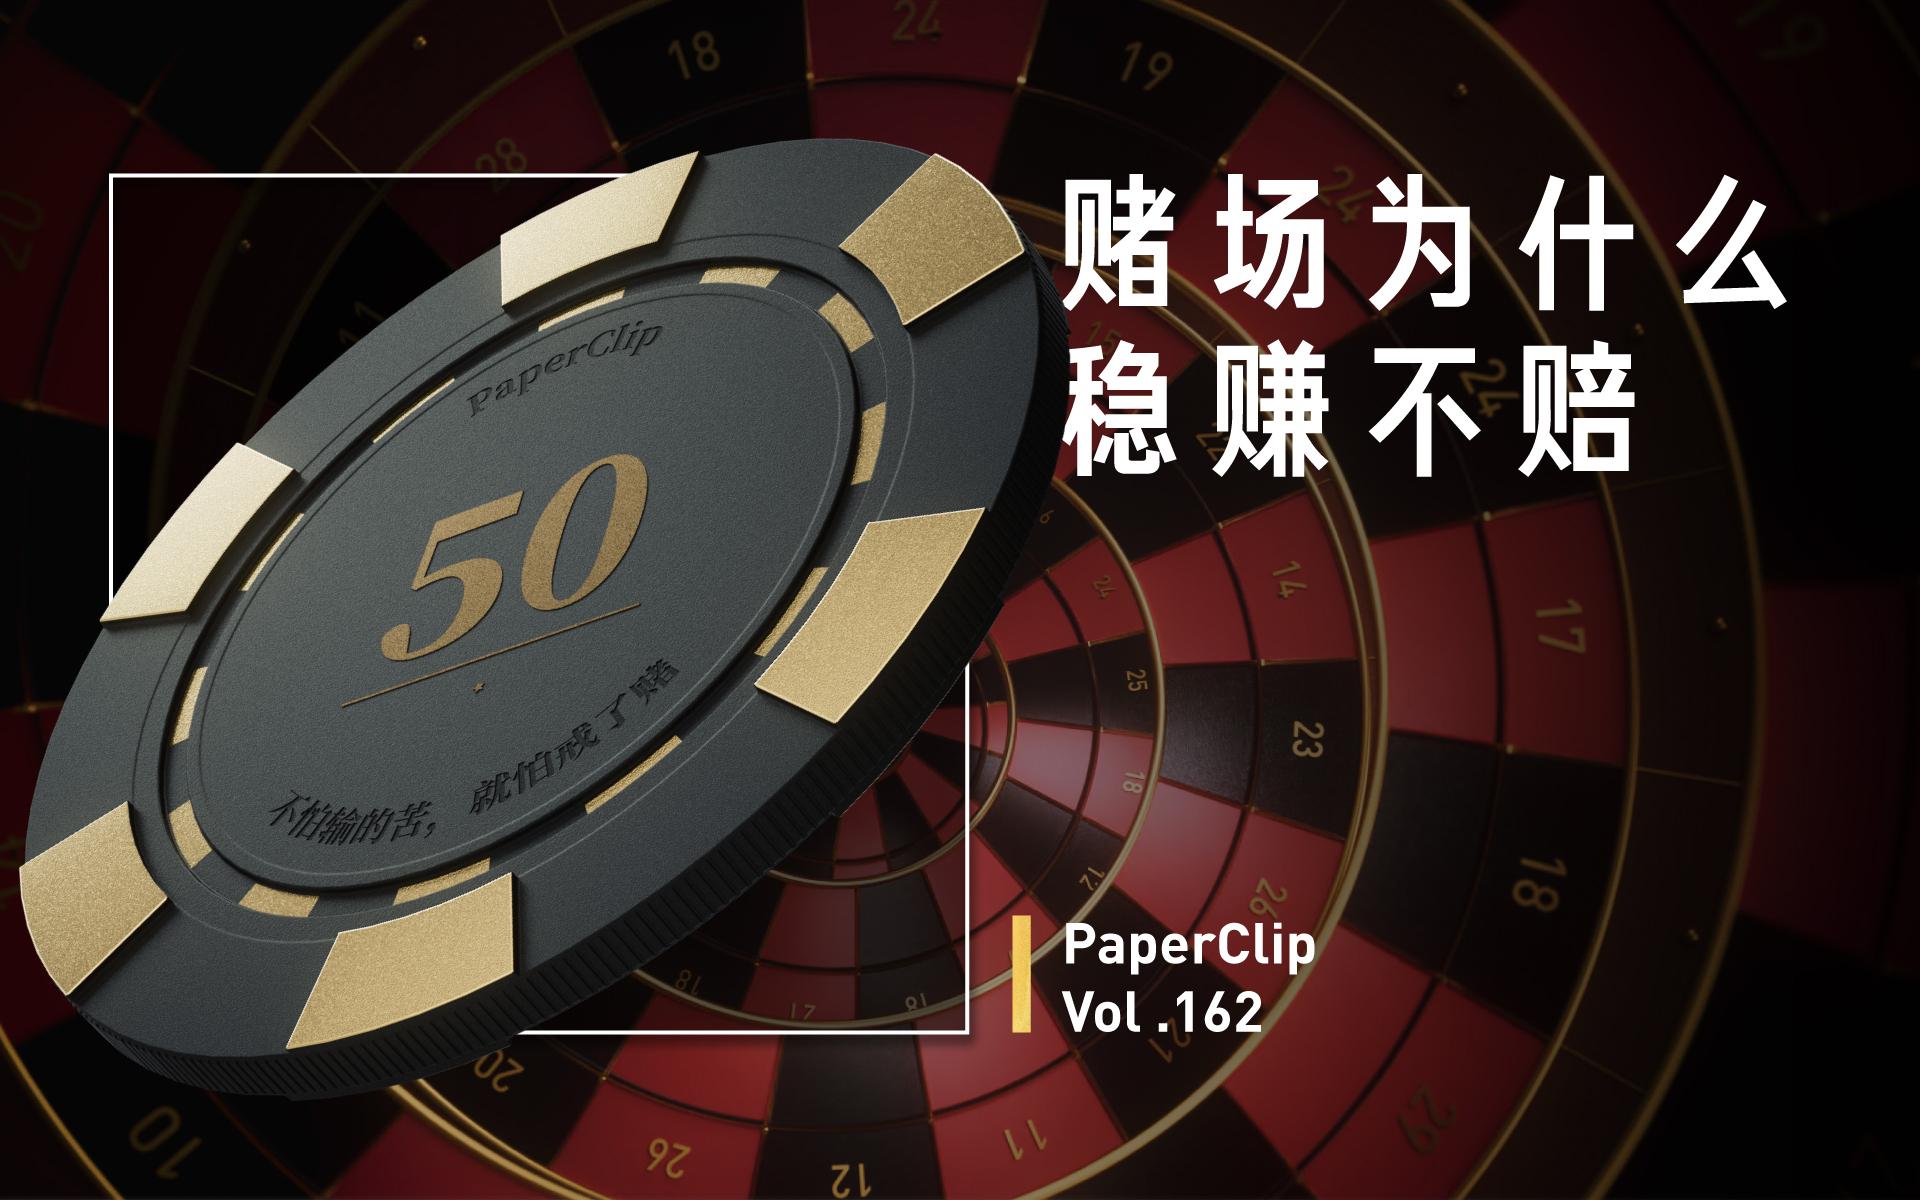 Vol.162 赌场为什么稳赚不赔?